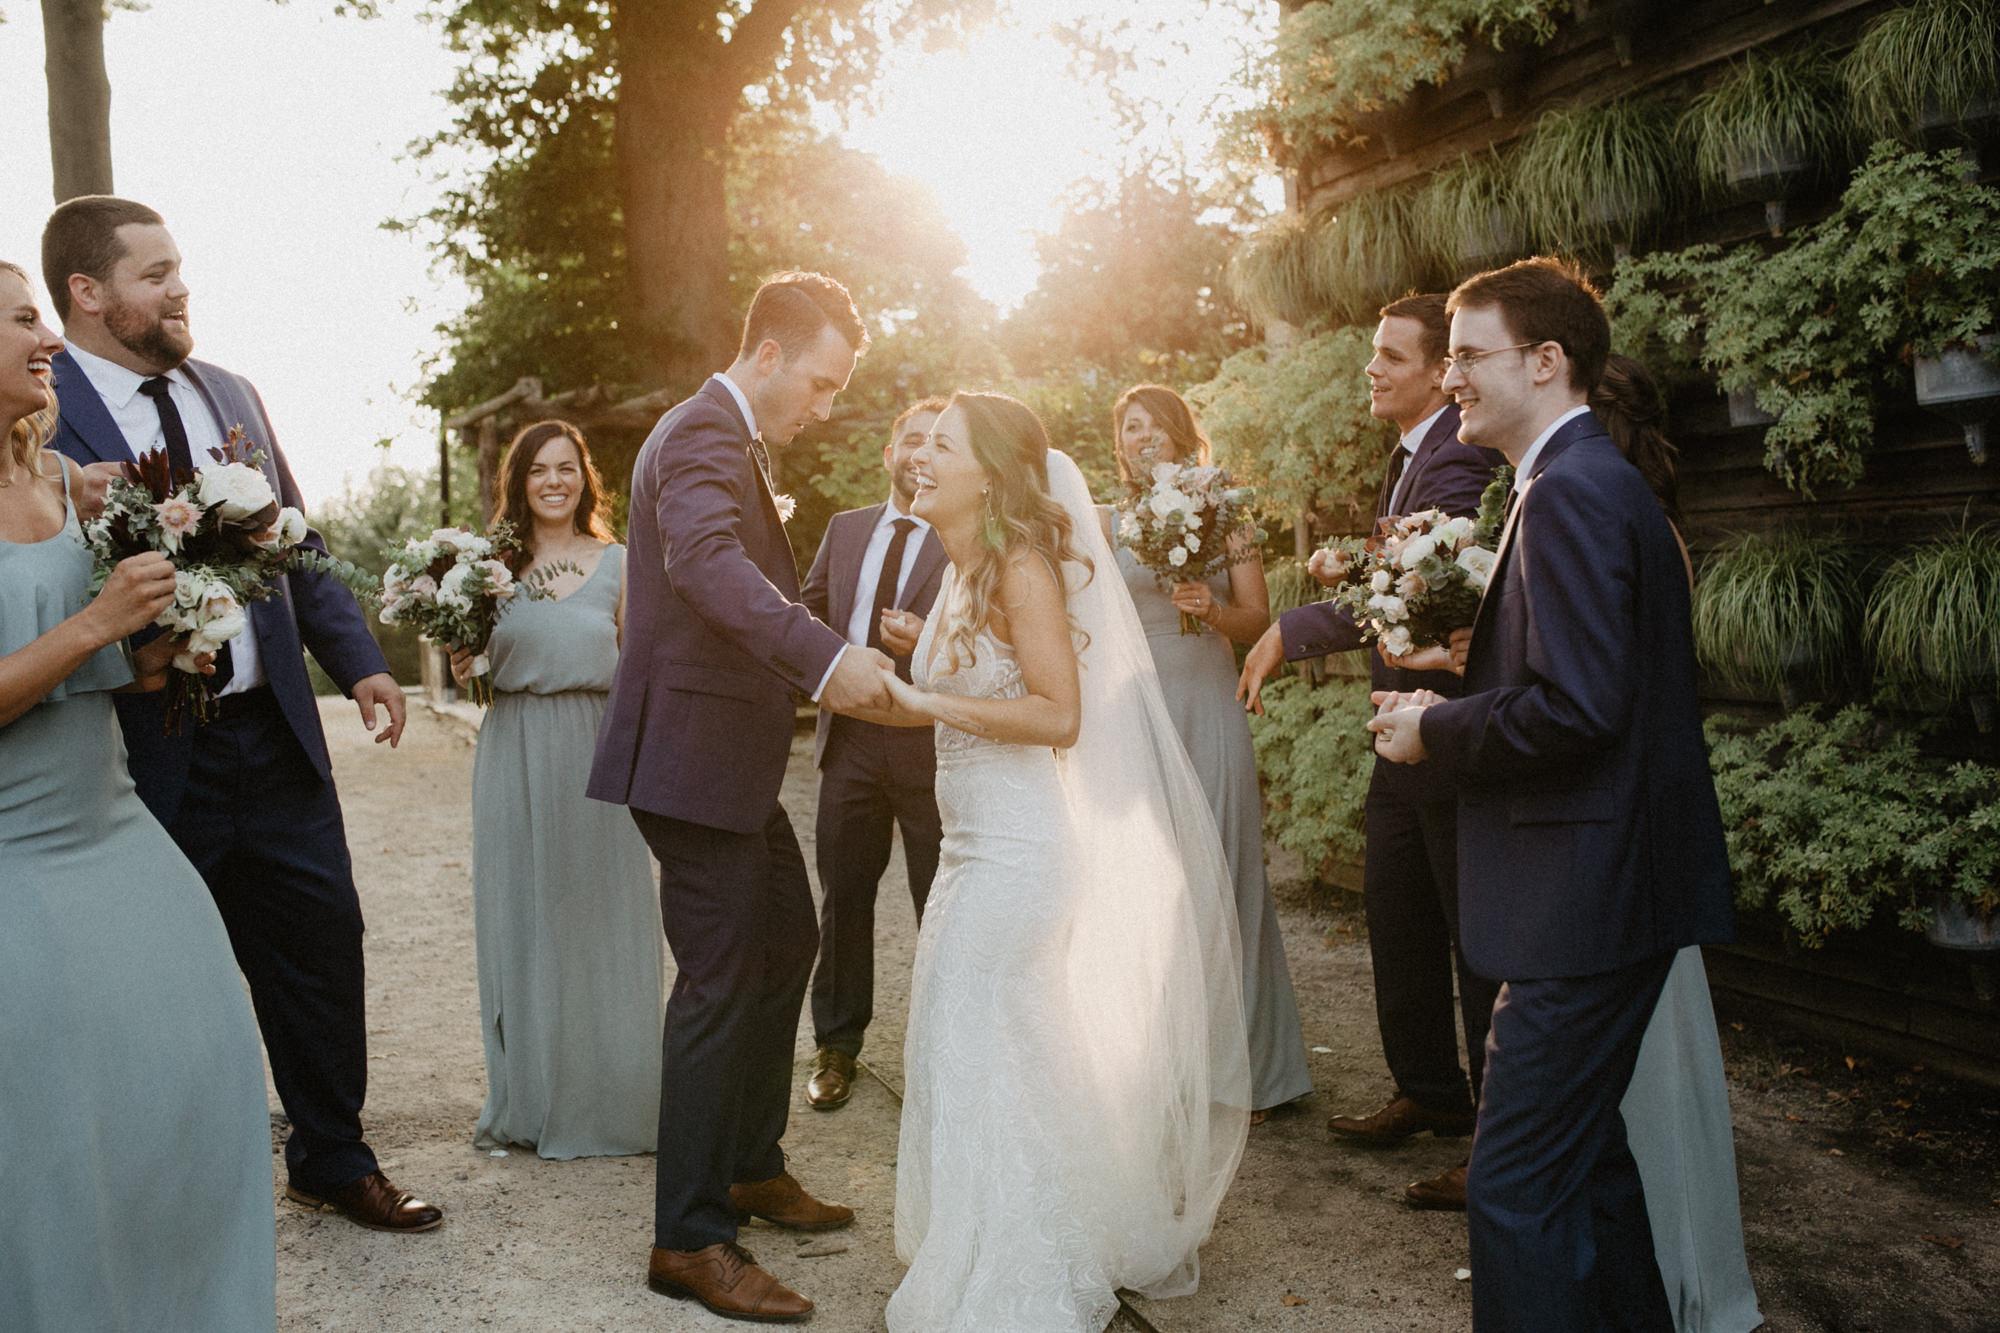 terrain-events-wedding-photographer-42.jpg